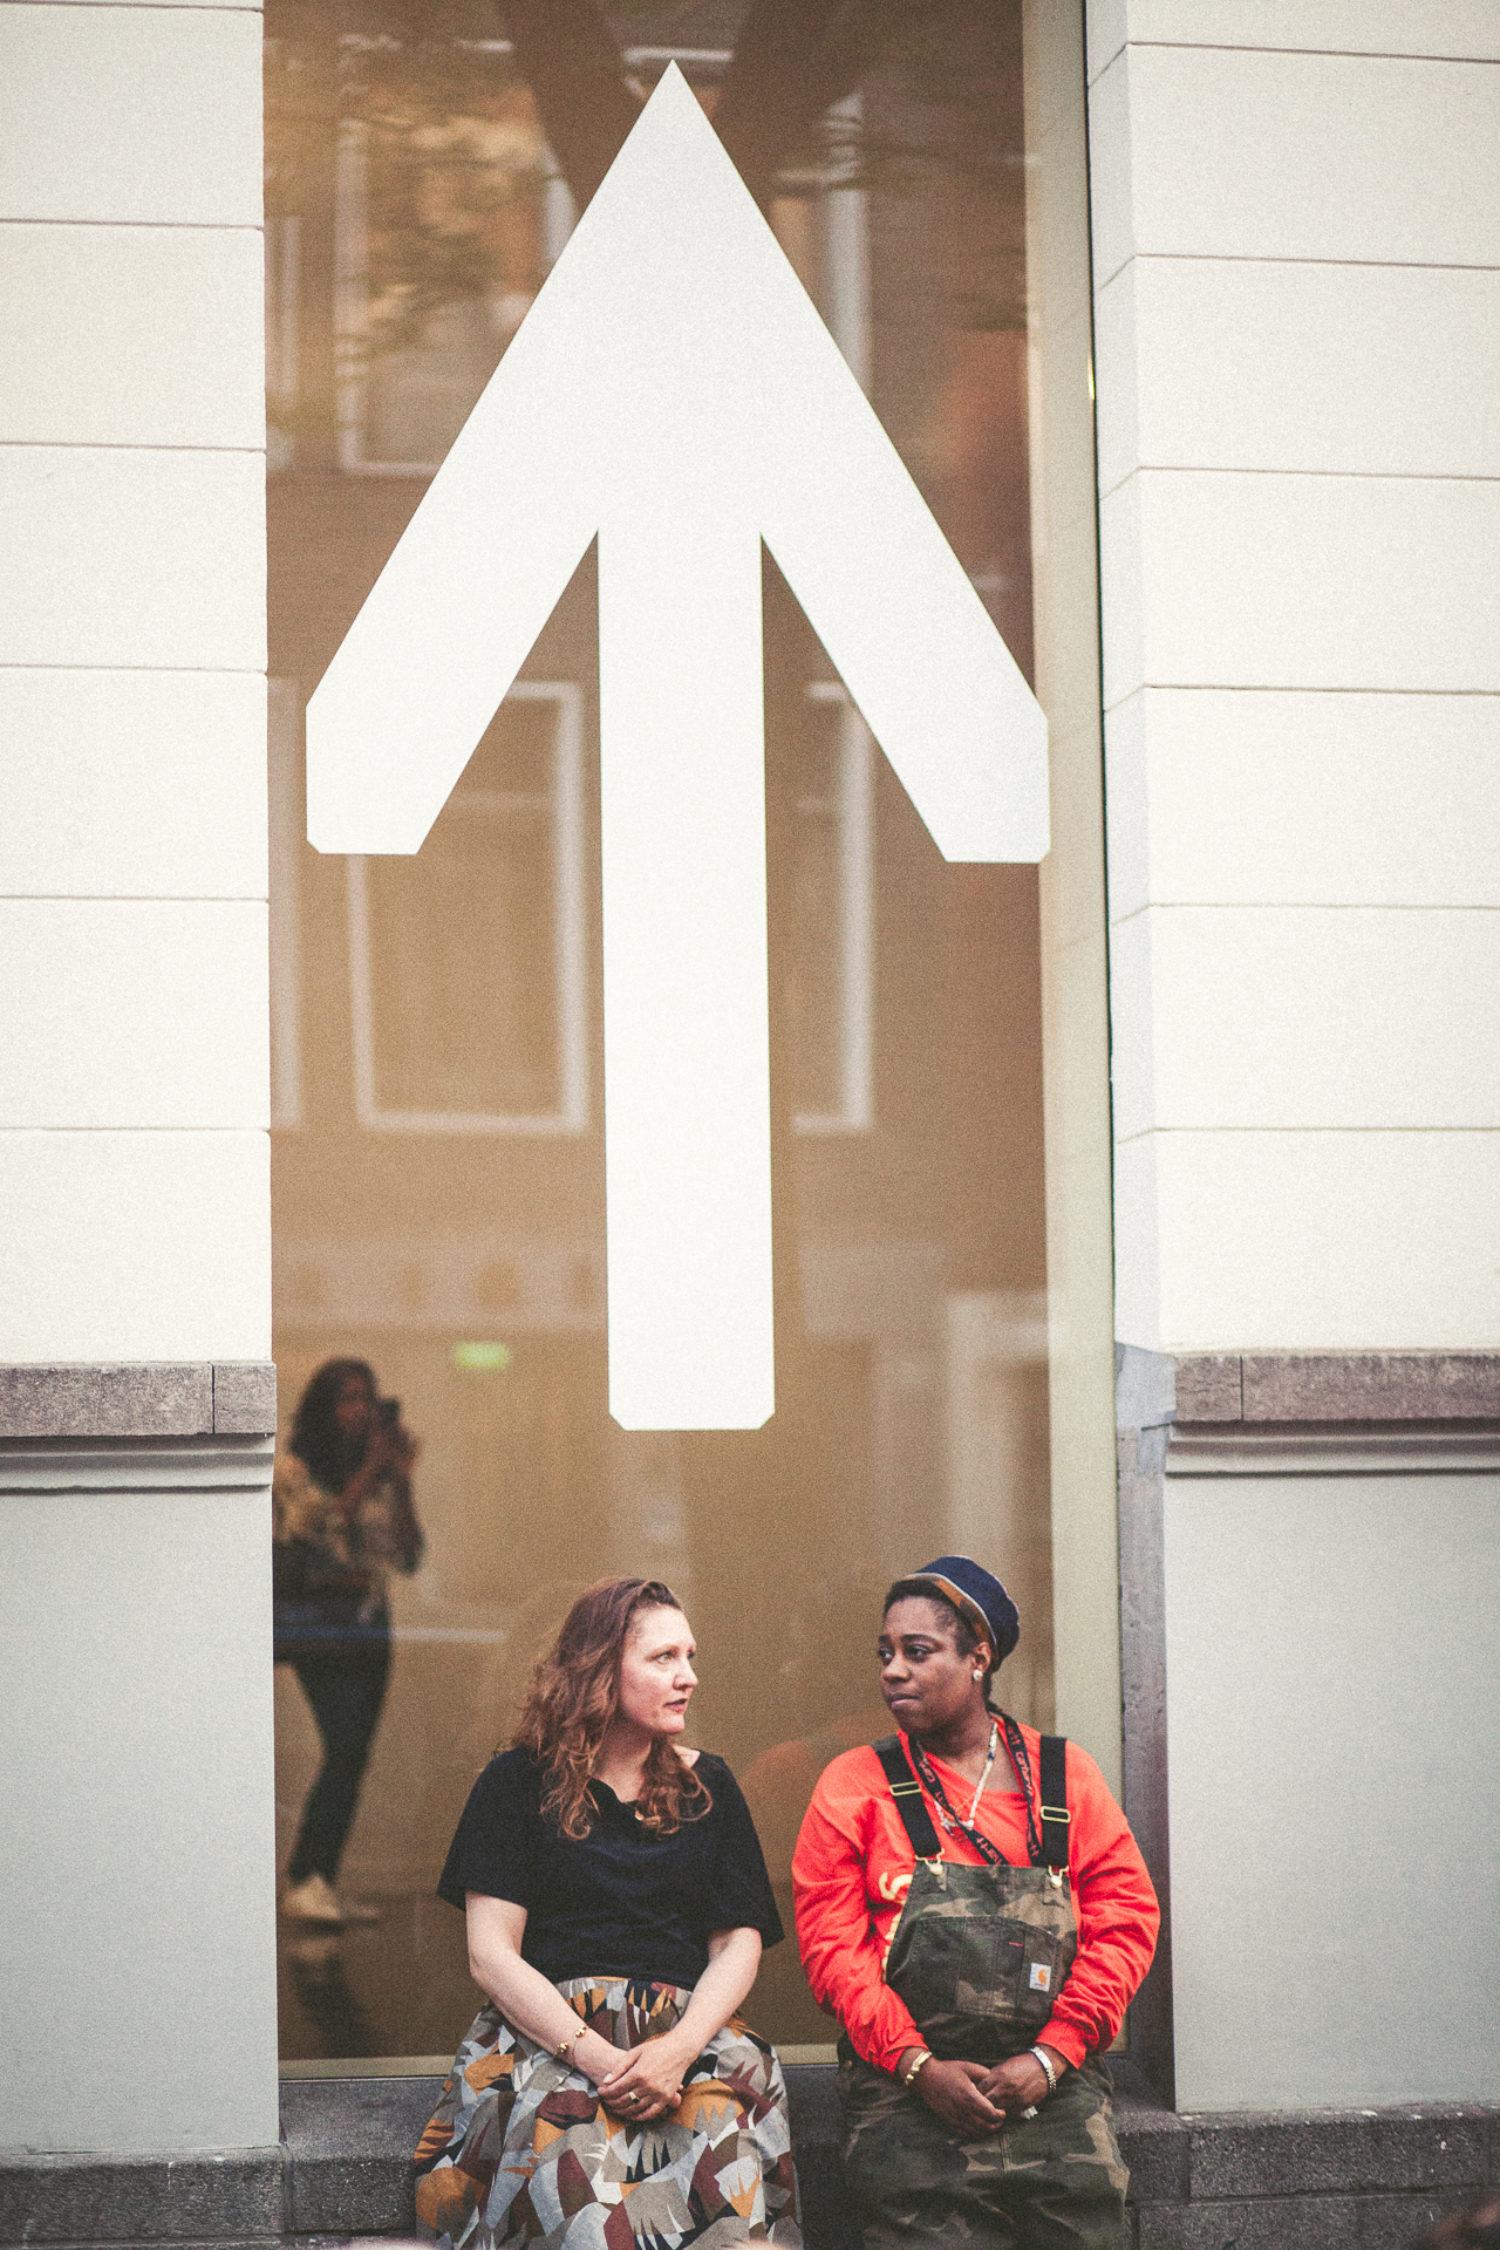 Bereikbaarheid - TENT Rotterdam | Platform voor hedendaagse kunst